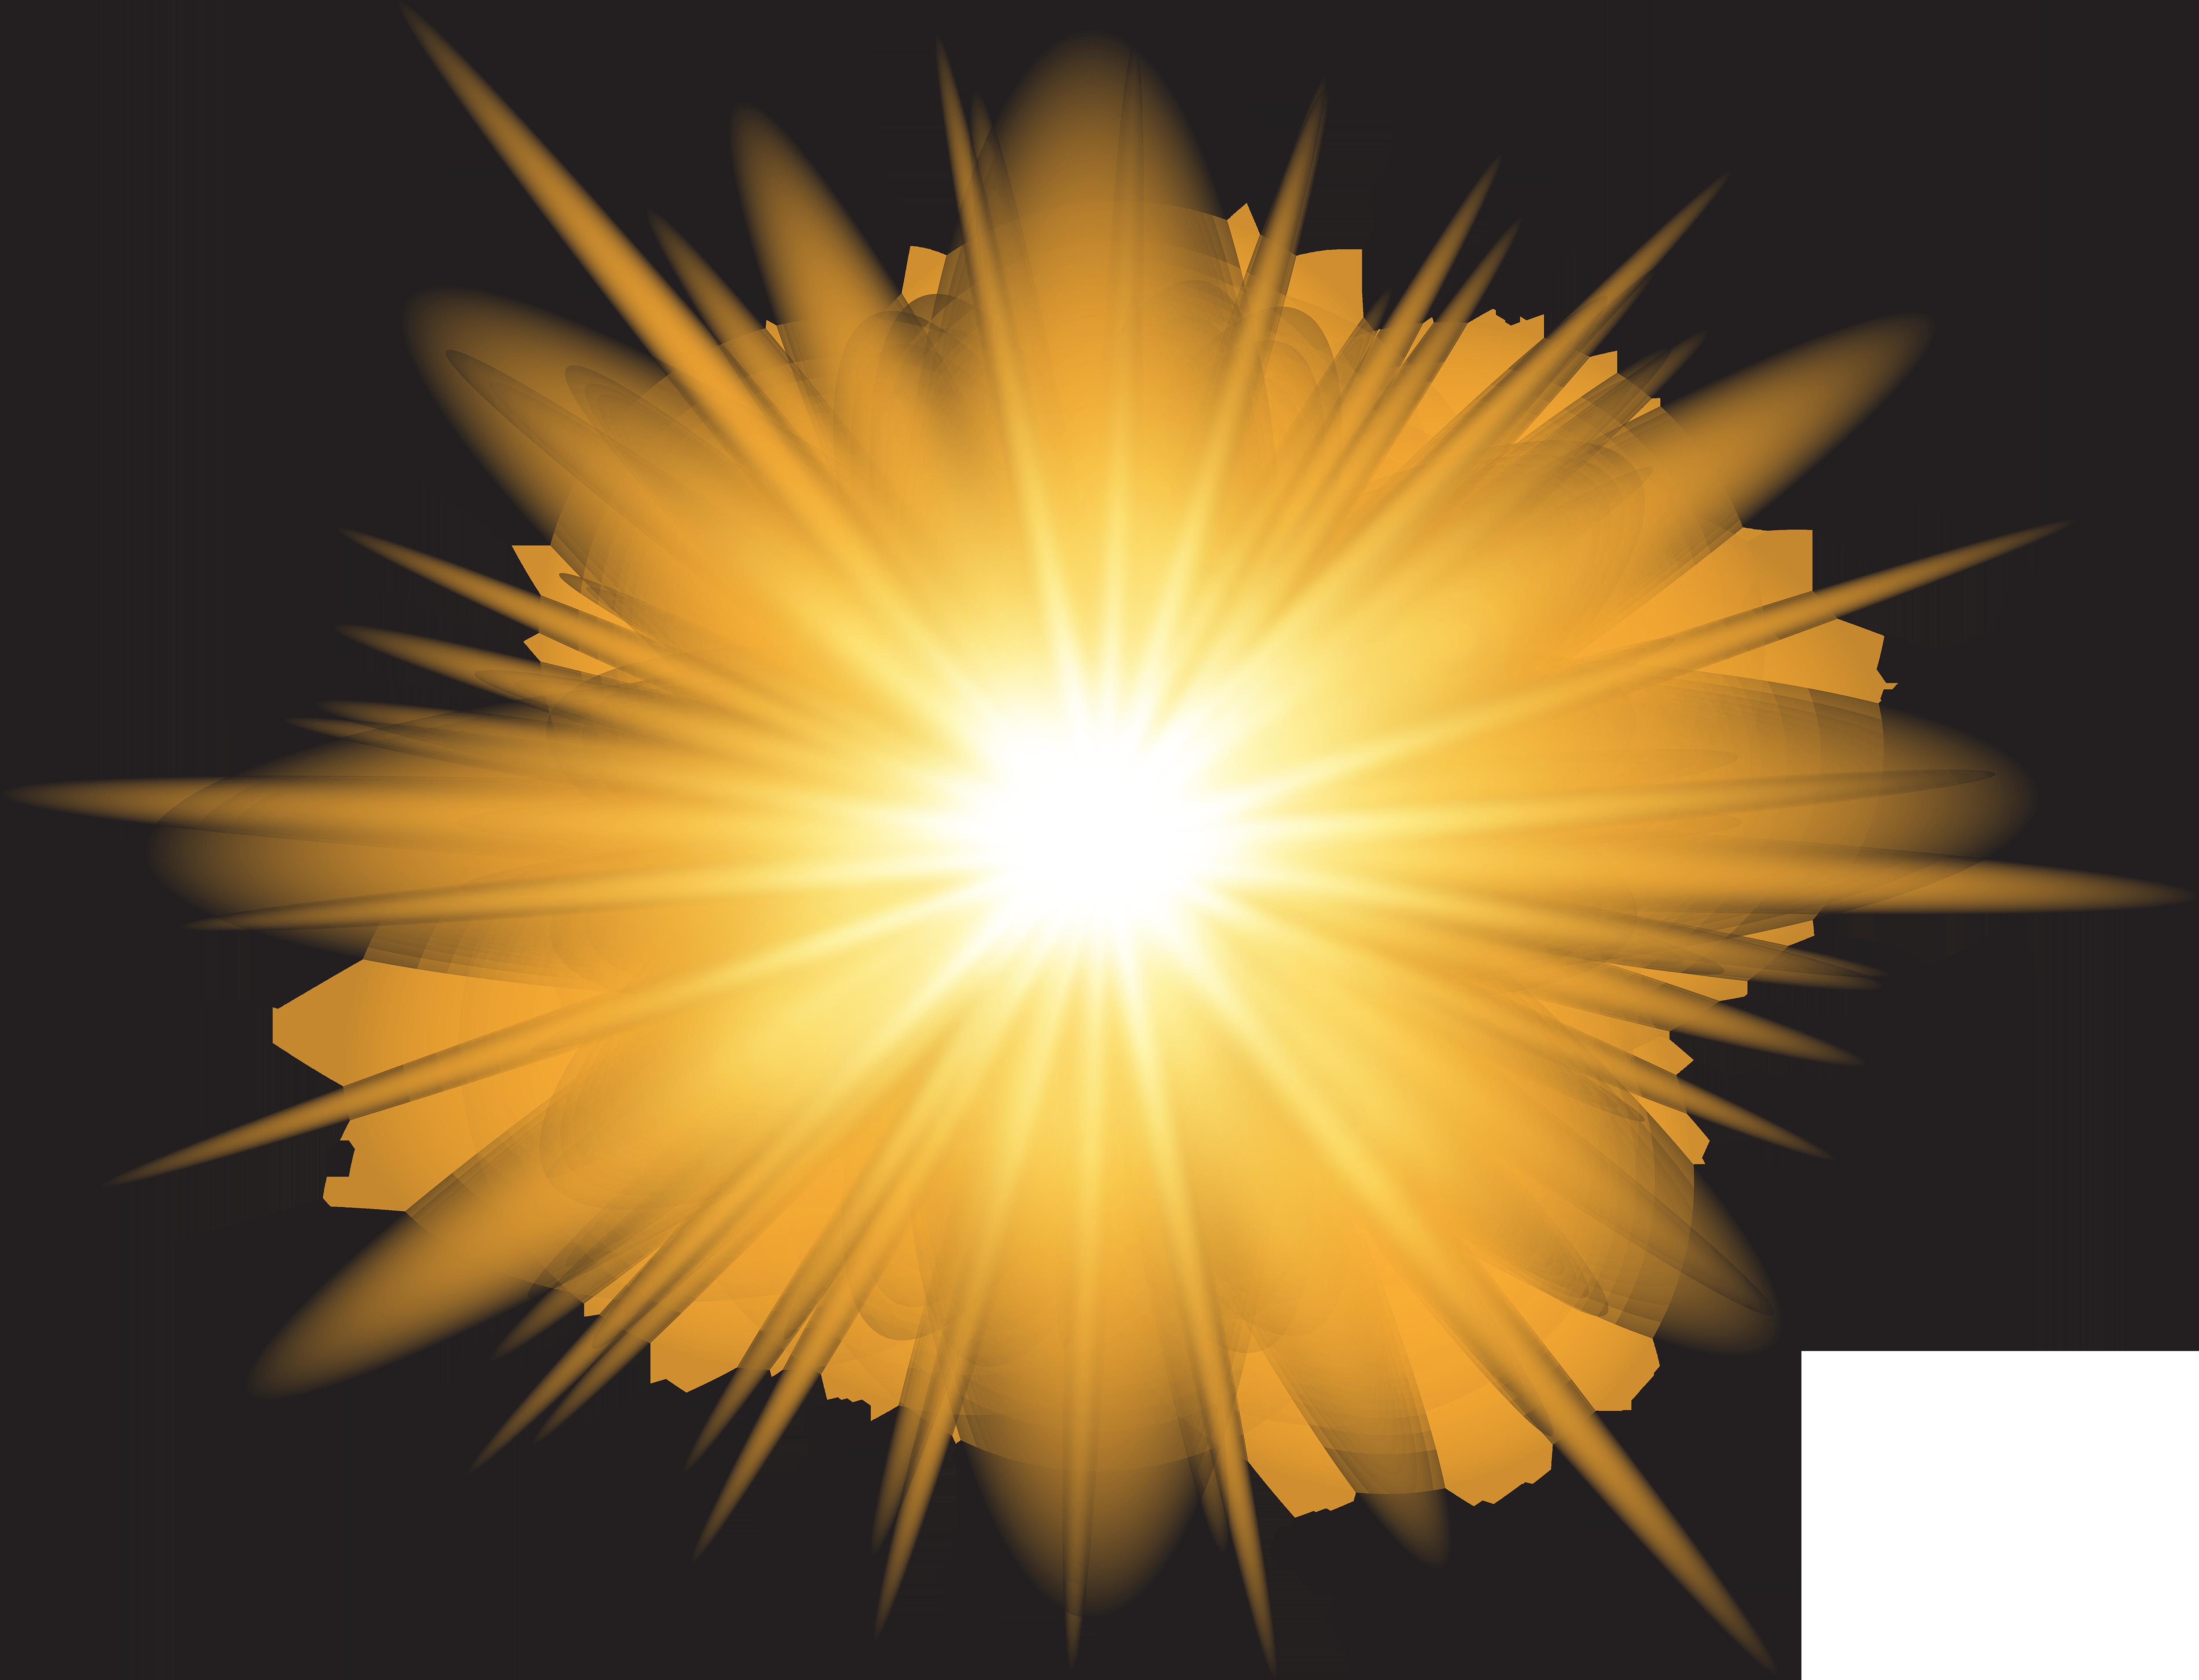 Sunlight PNG HD - 140496